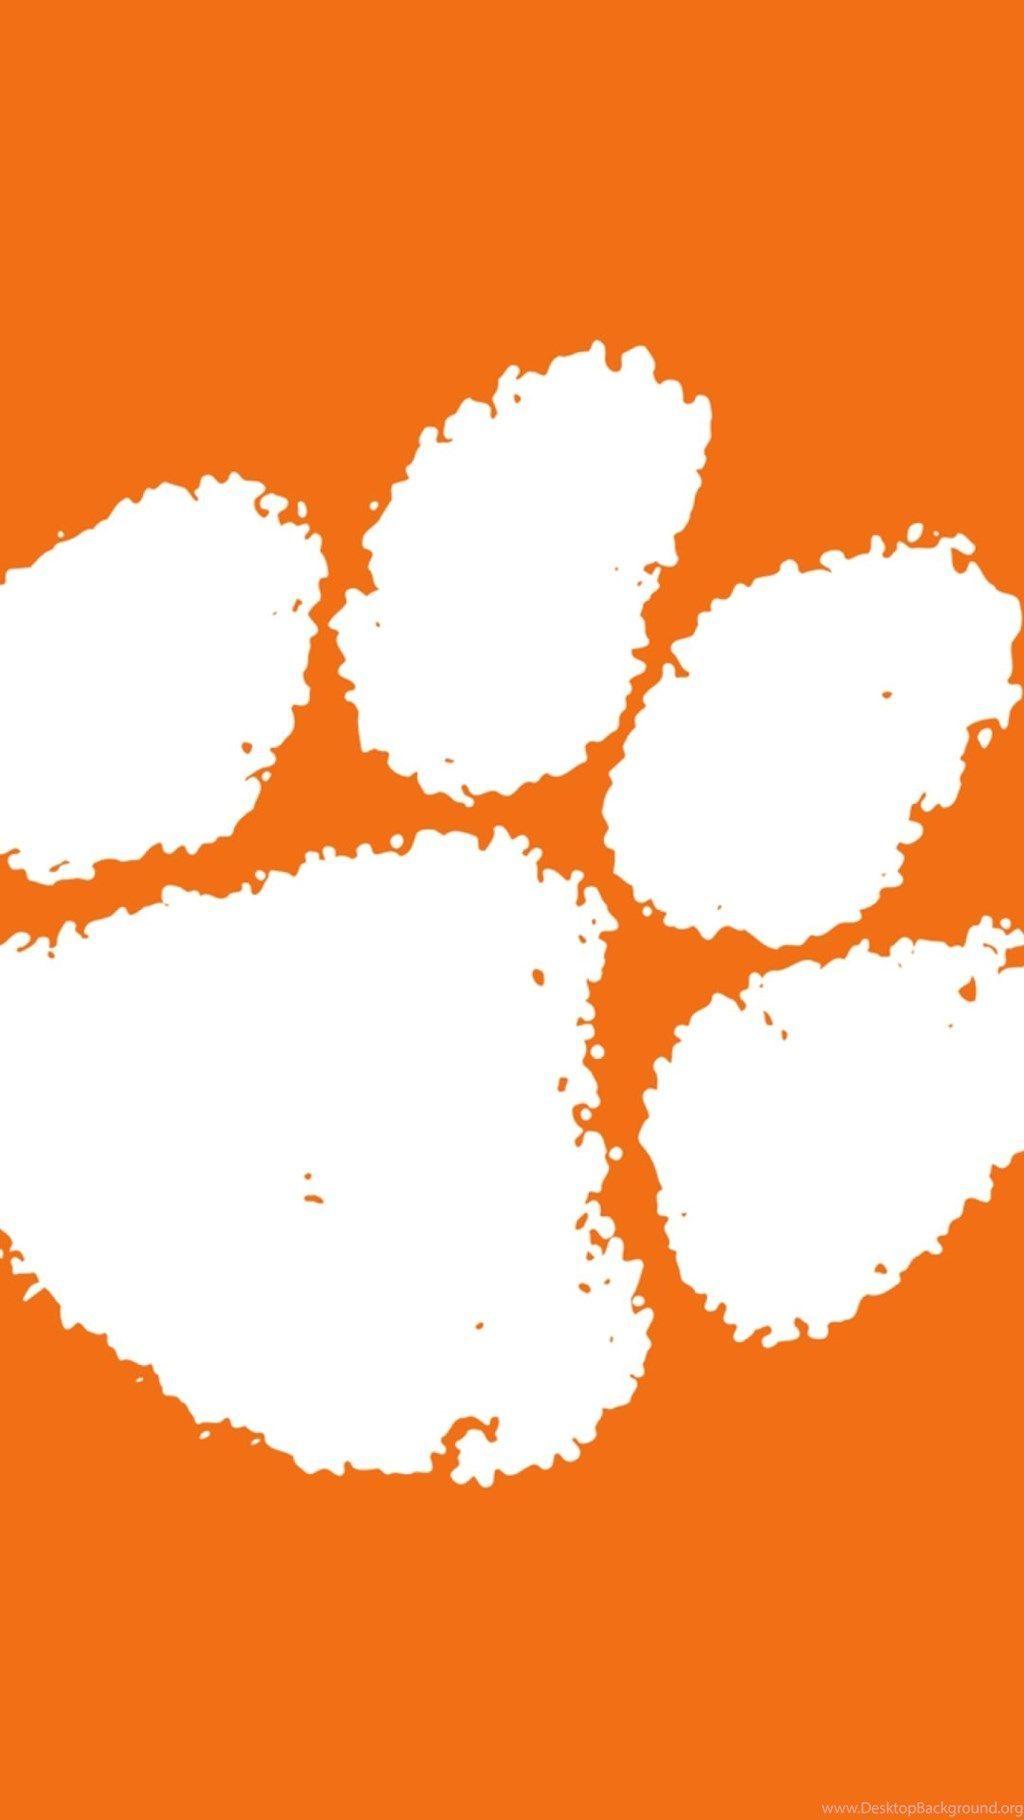 35 Clemson Iphone Wallpapers Download At Wallpaperbro In 2020 Clemson Tigers Wallpaper Clemson Tigers Clemson Wallpaper